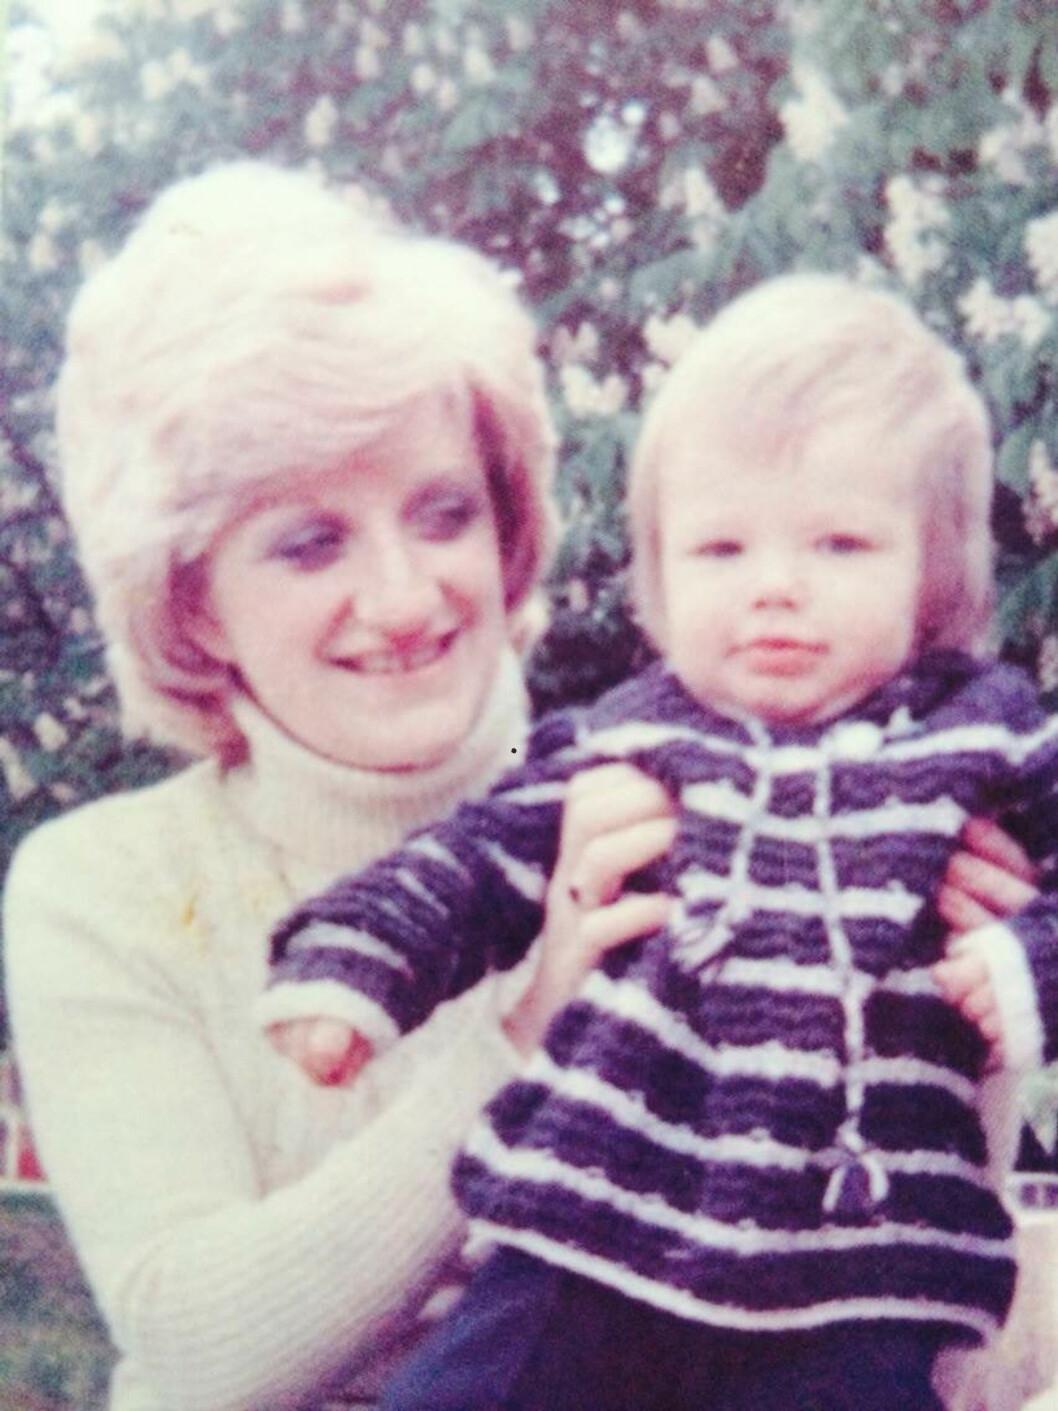 TIDLIG KRØKES: Lille David fotografert i mammas favn på midten av 70-tallet. Foto: NTB Scanpix